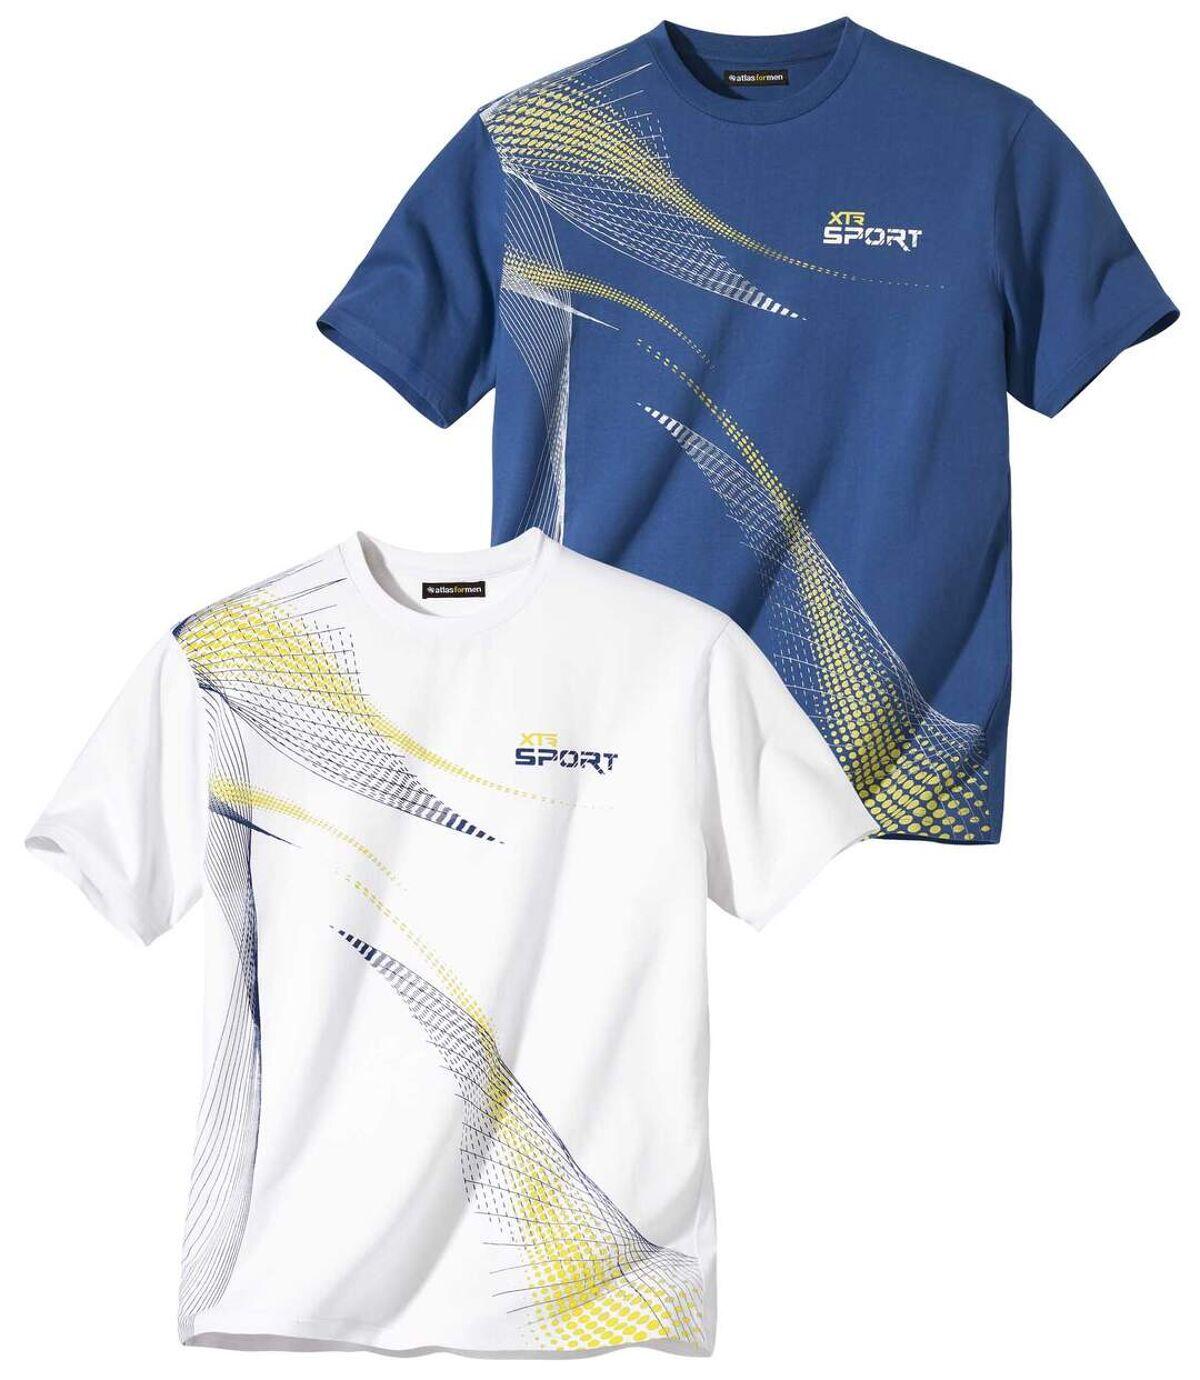 2darabos Sport póló szett  Atlas For Men